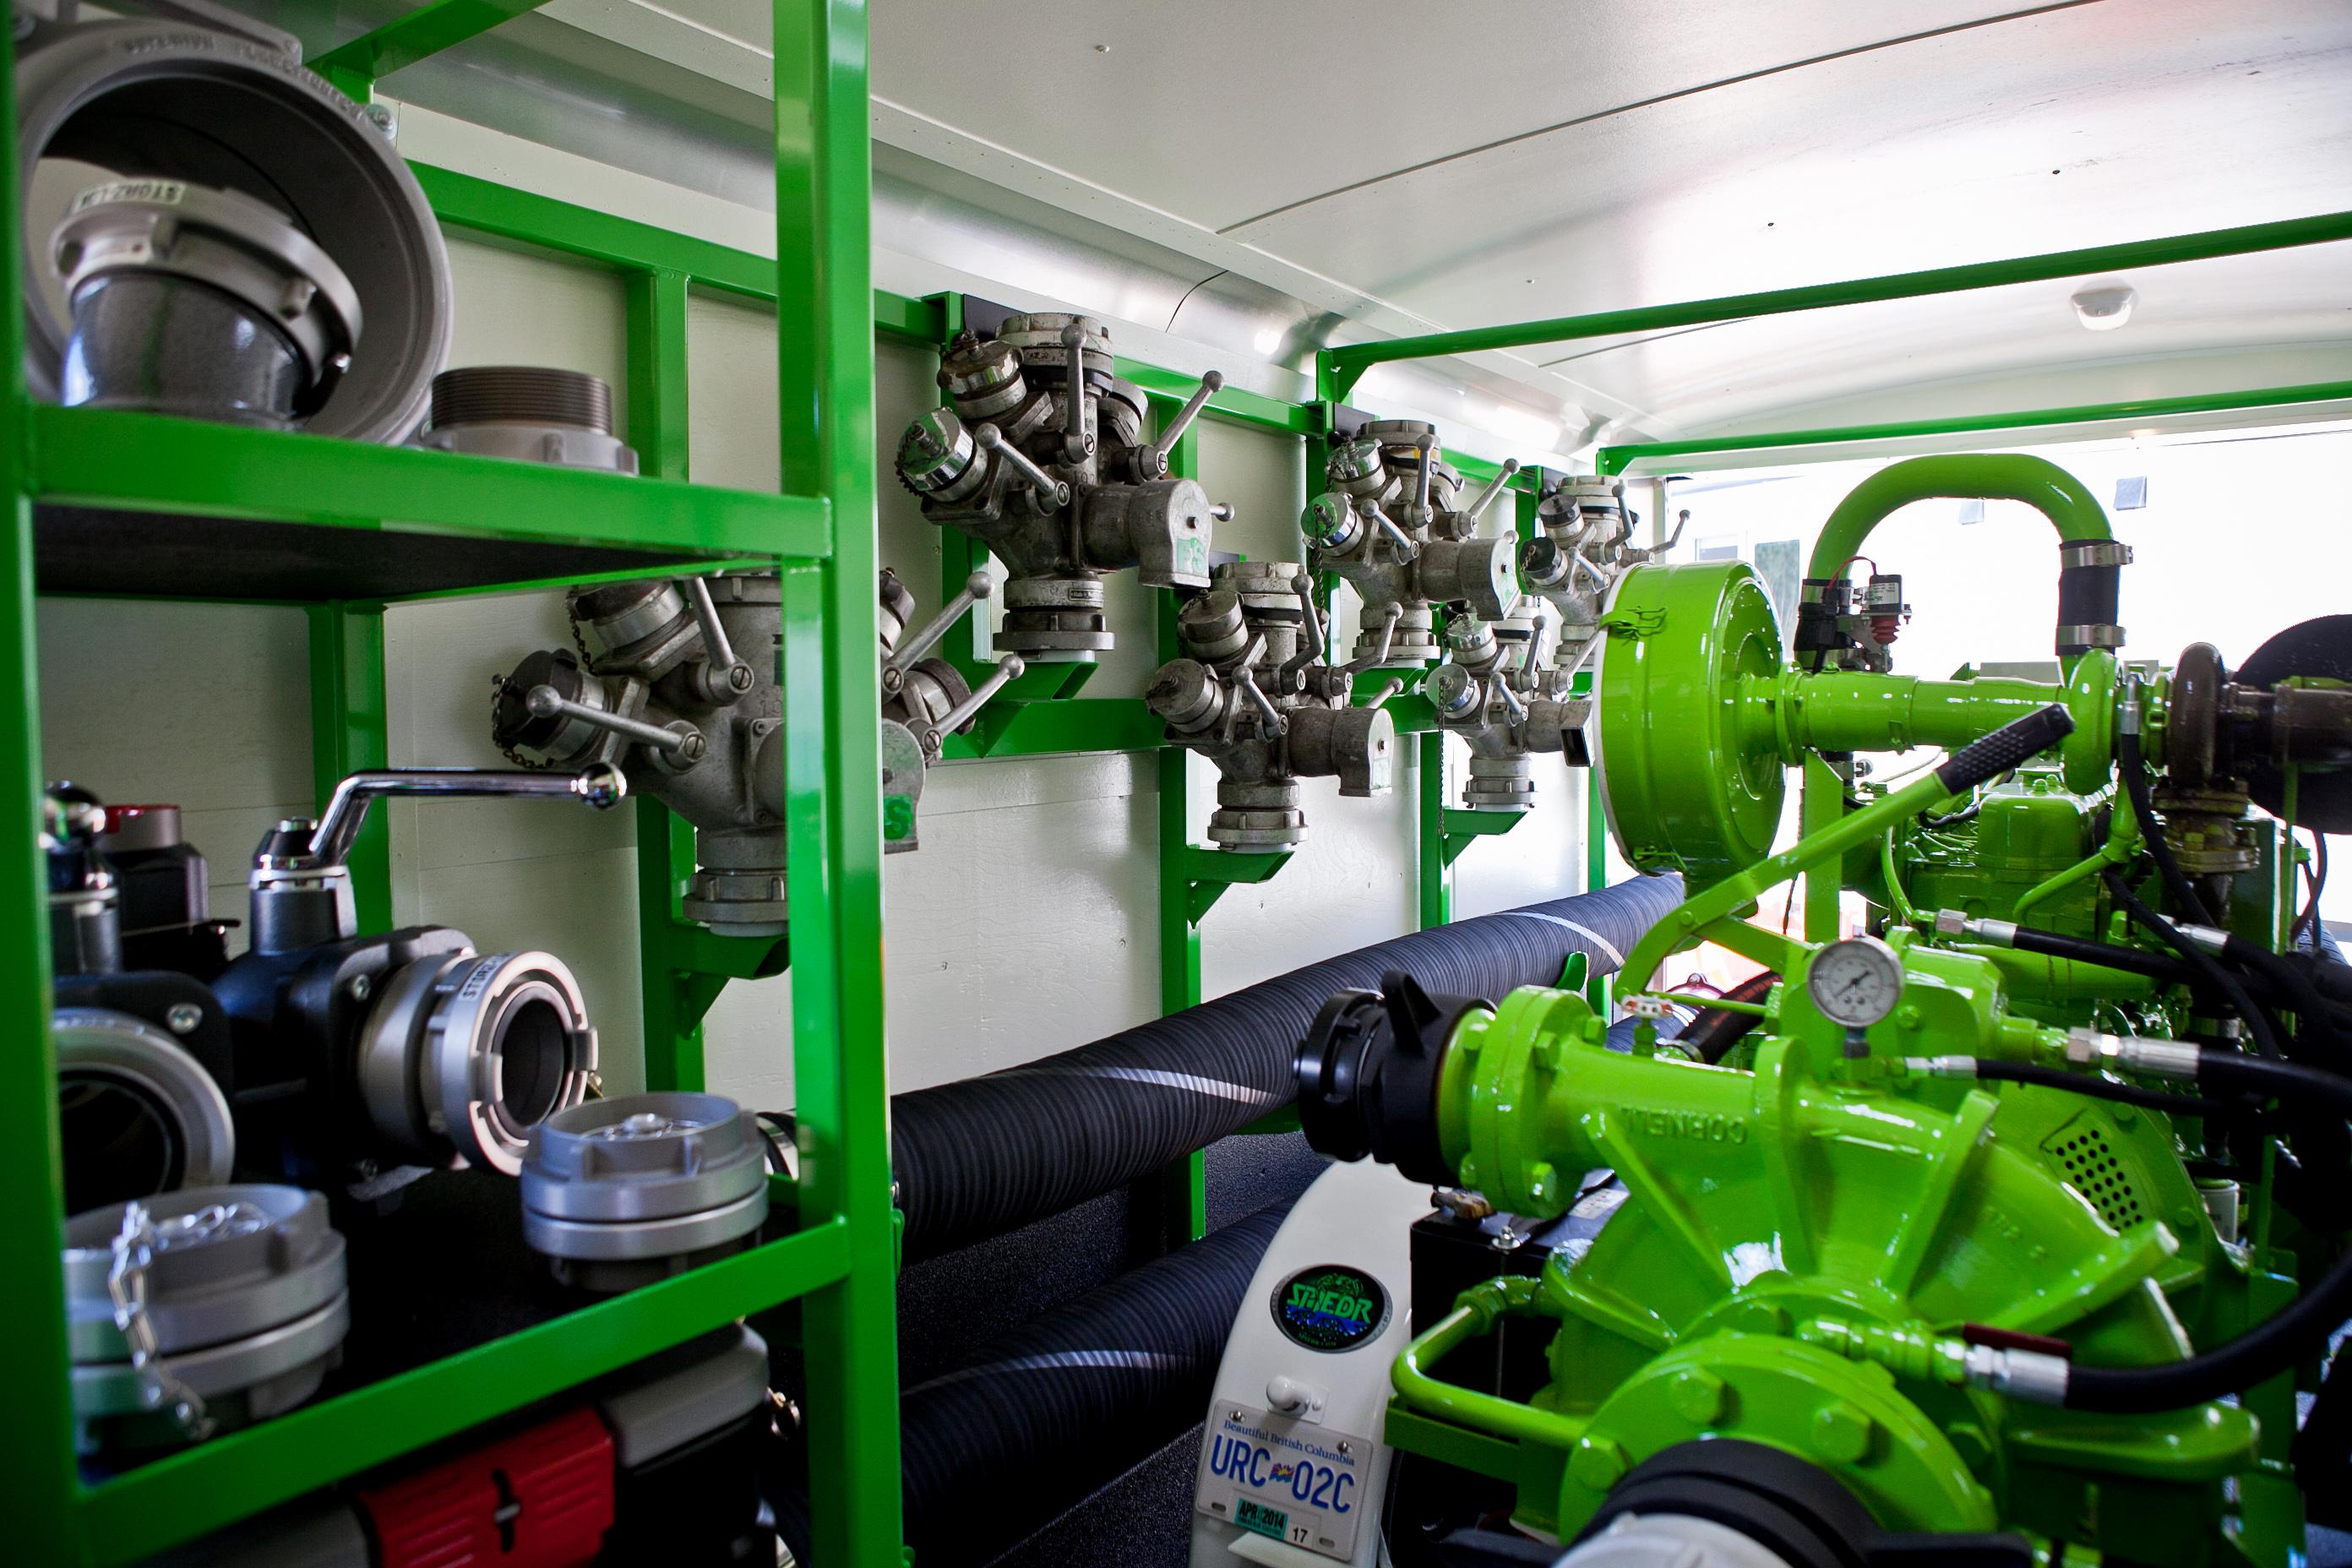 Inside of a SPIEDR trailer